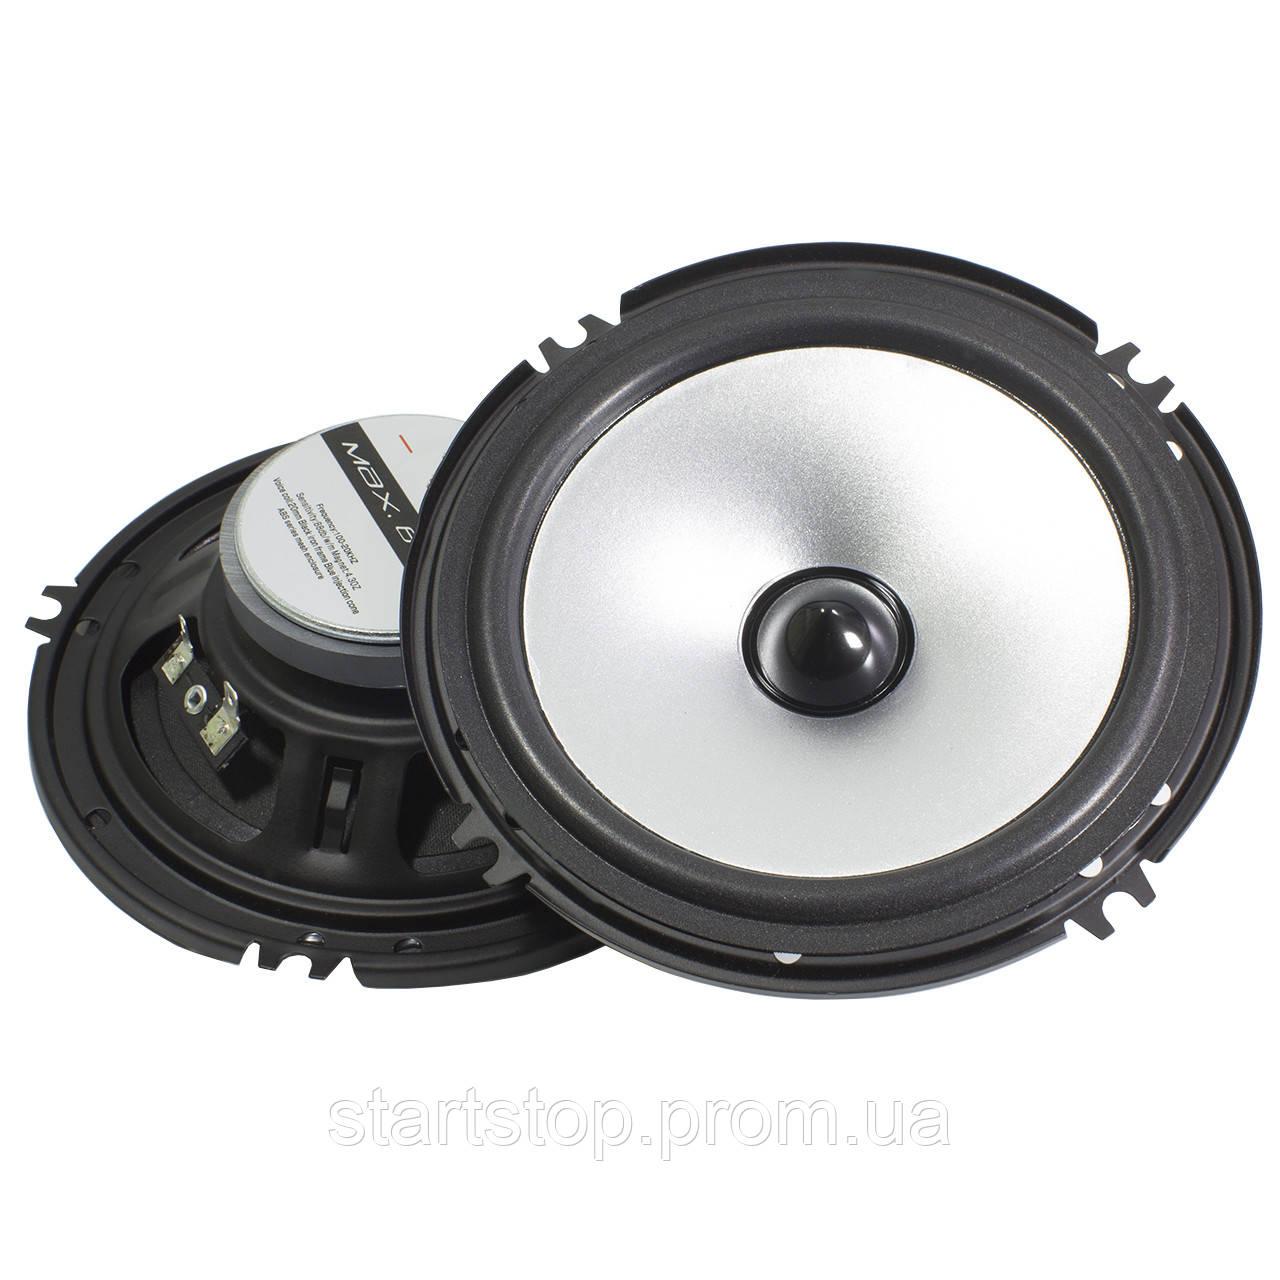 Купить Автоакустика Labo LB-PS1651D 60 Вт 6.5-дюймов (2399-7396a)